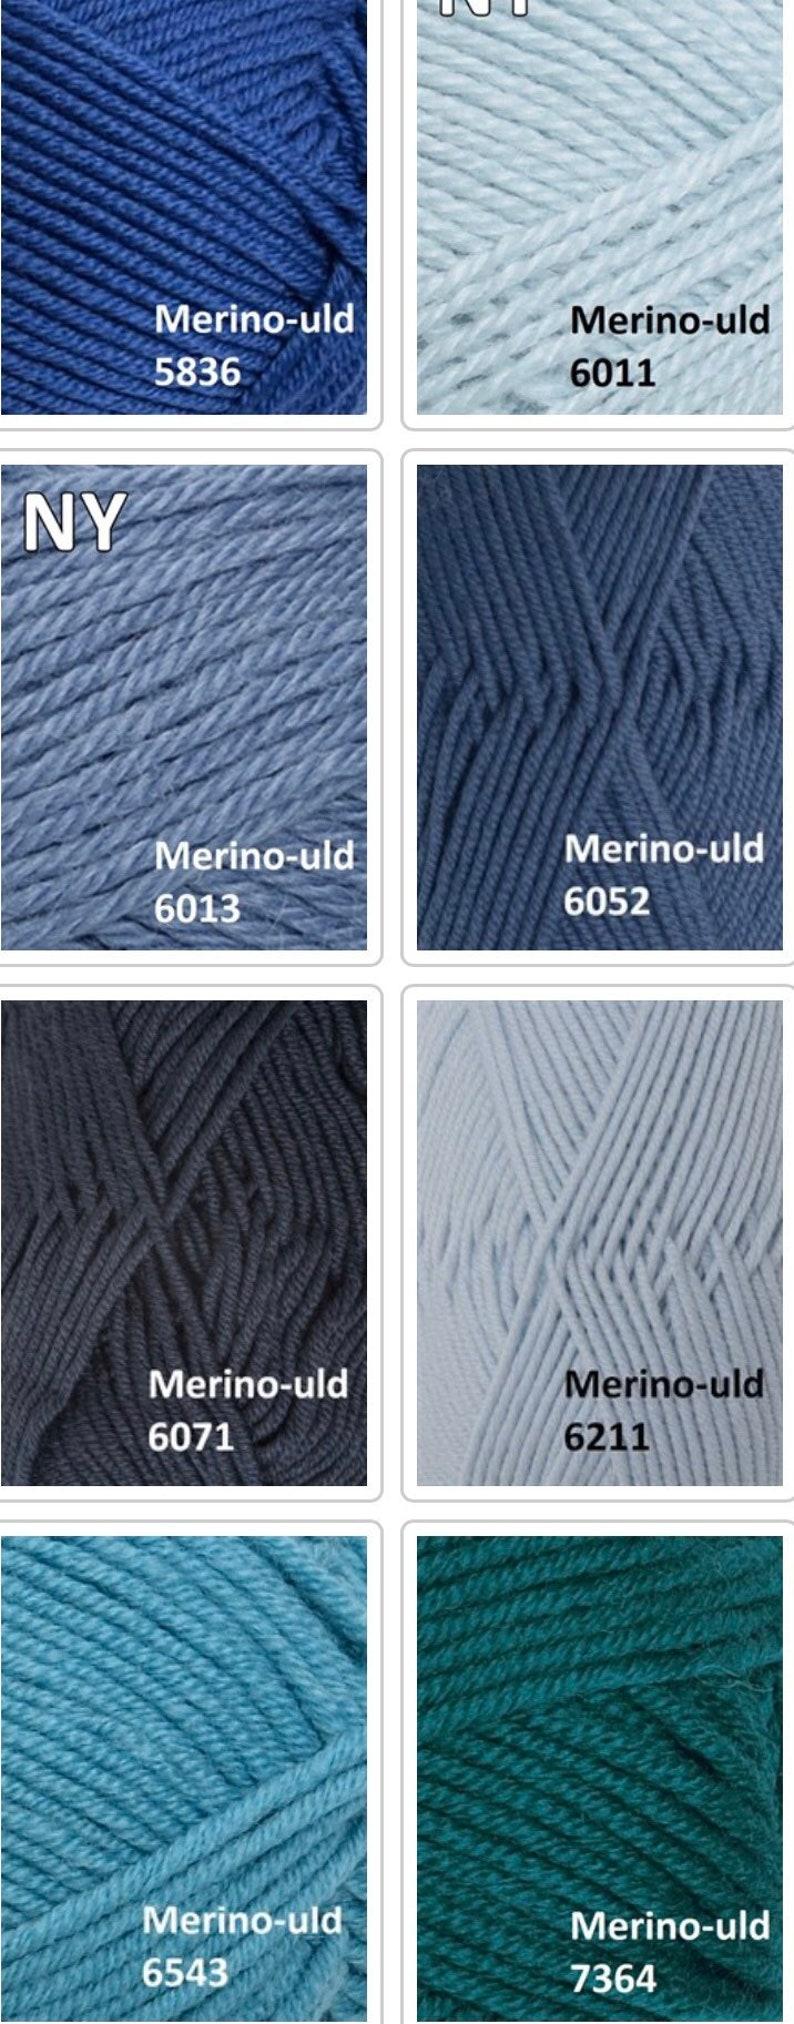 high quality softest merino wool MADE TO ORDERKnitted baby girl romper